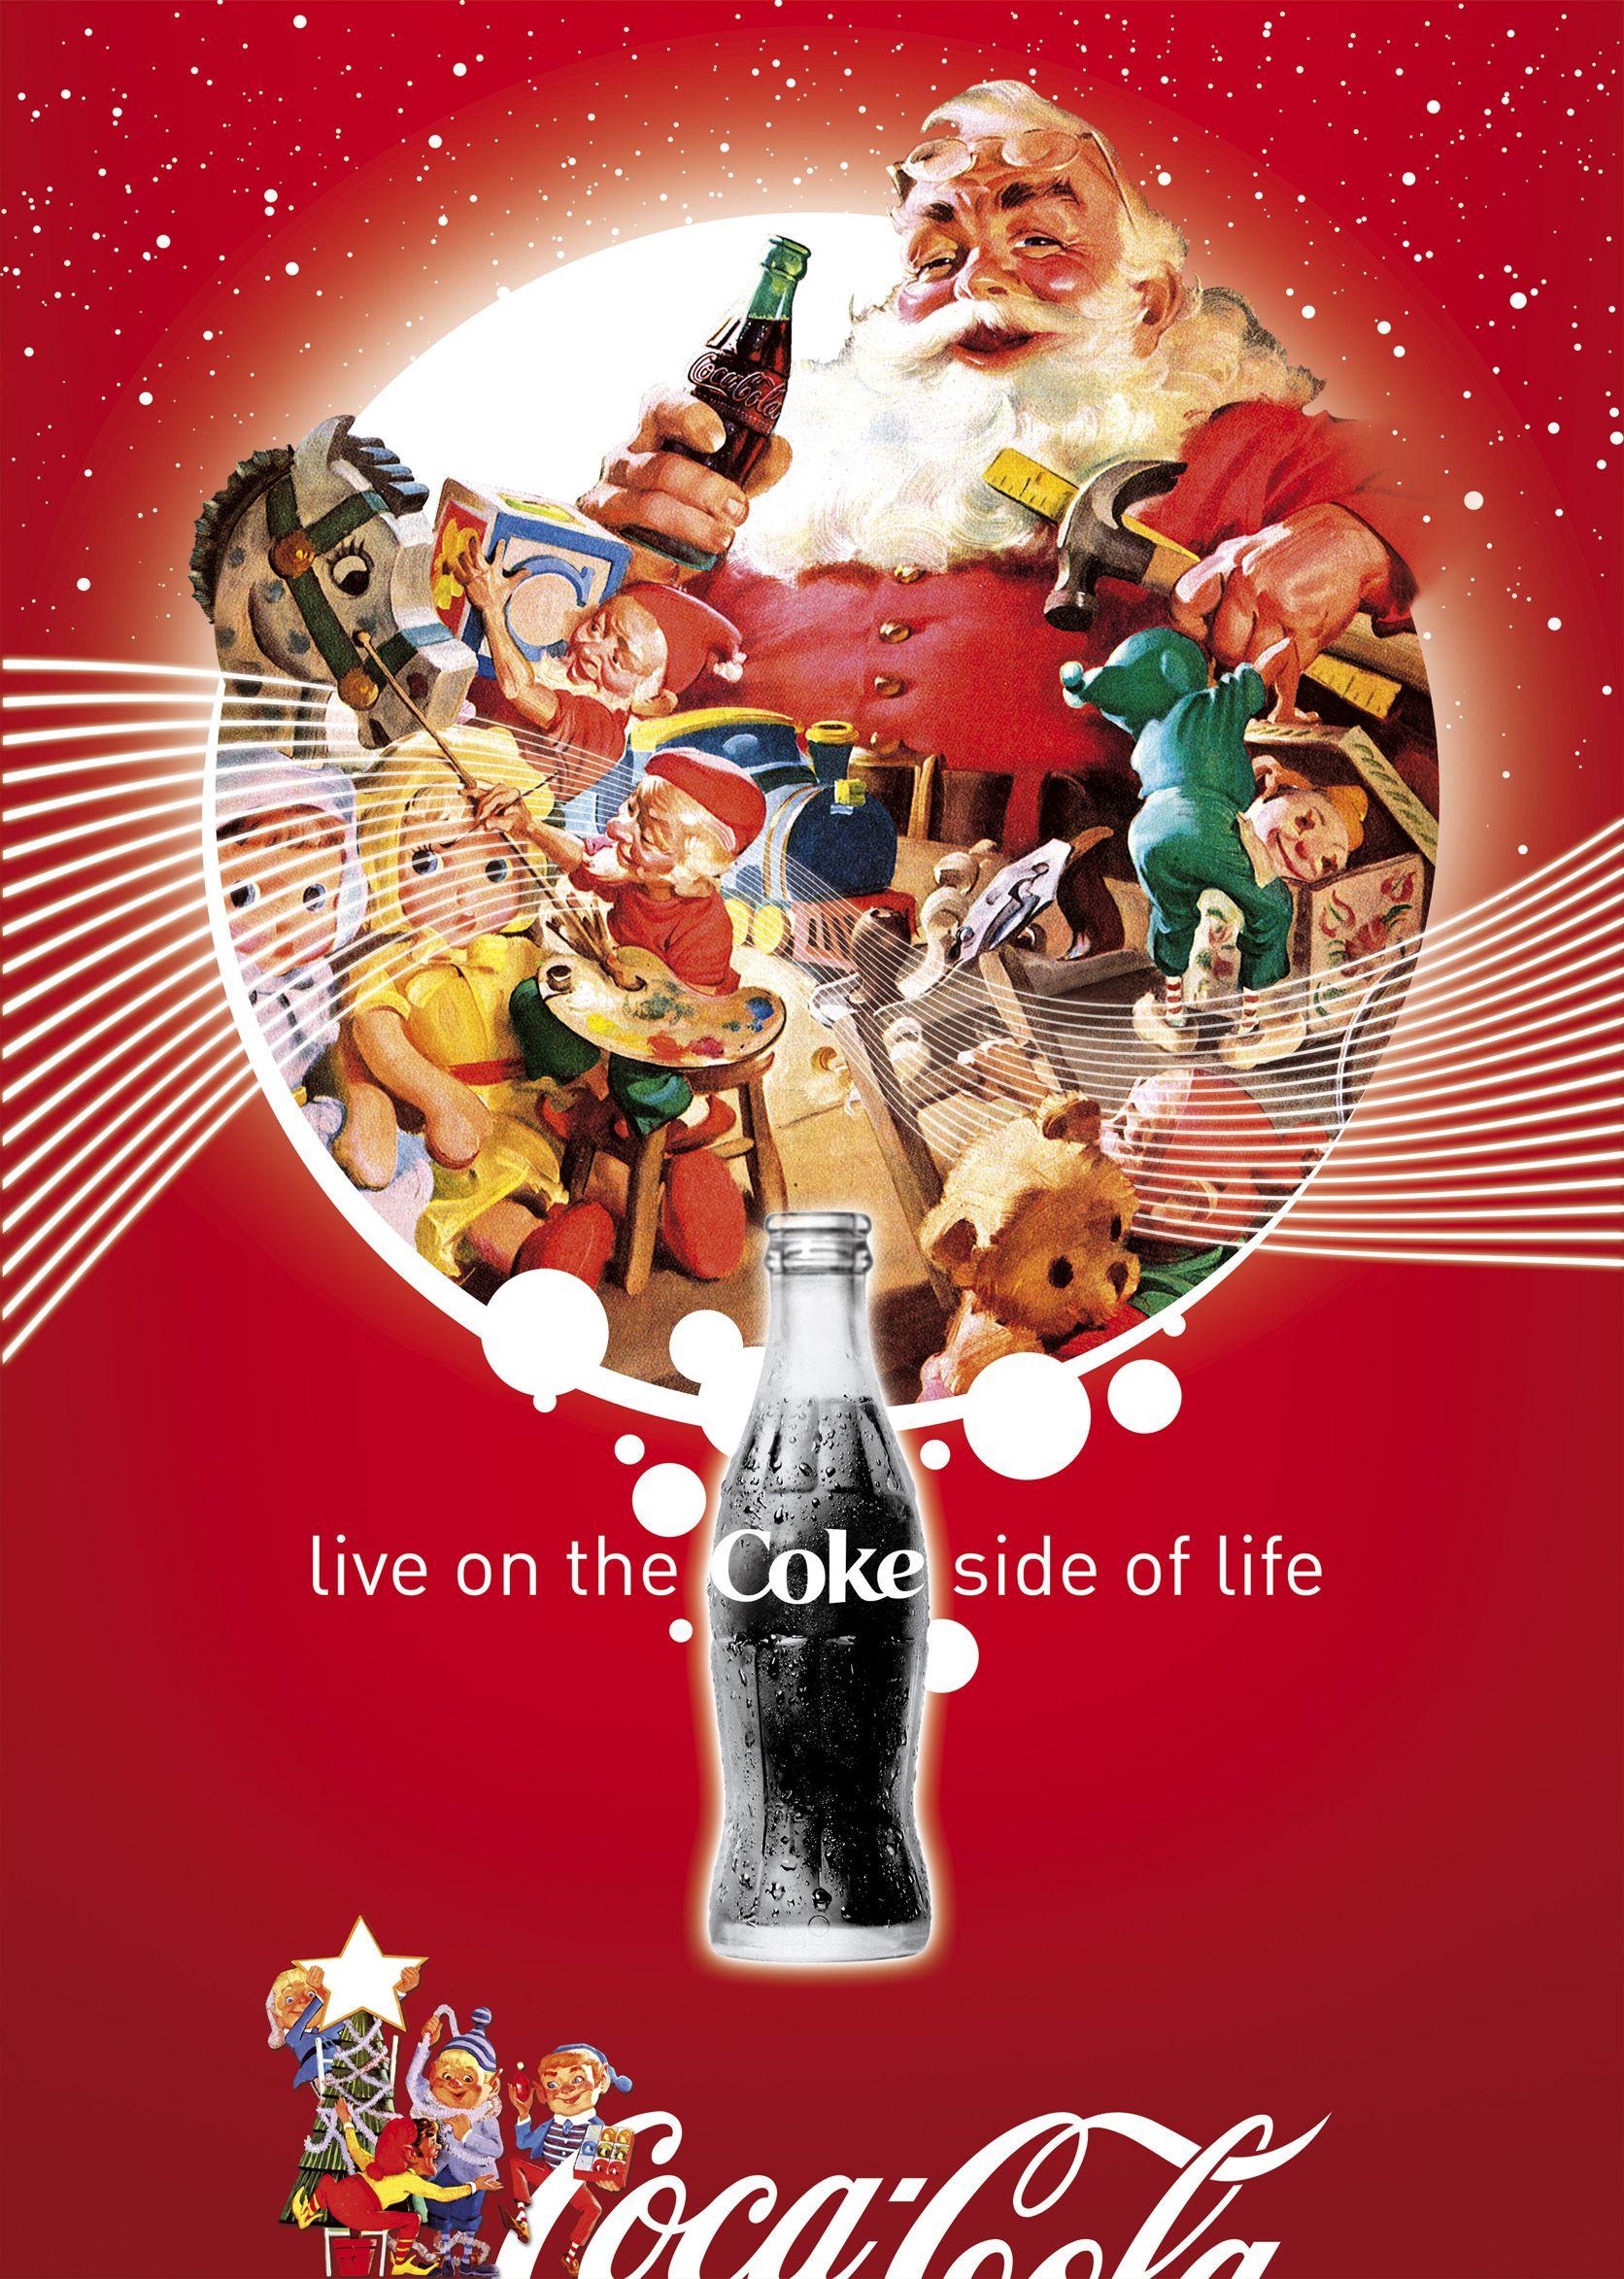 Coke Christmas Ads.Coke Christmas Christmas Advertisements